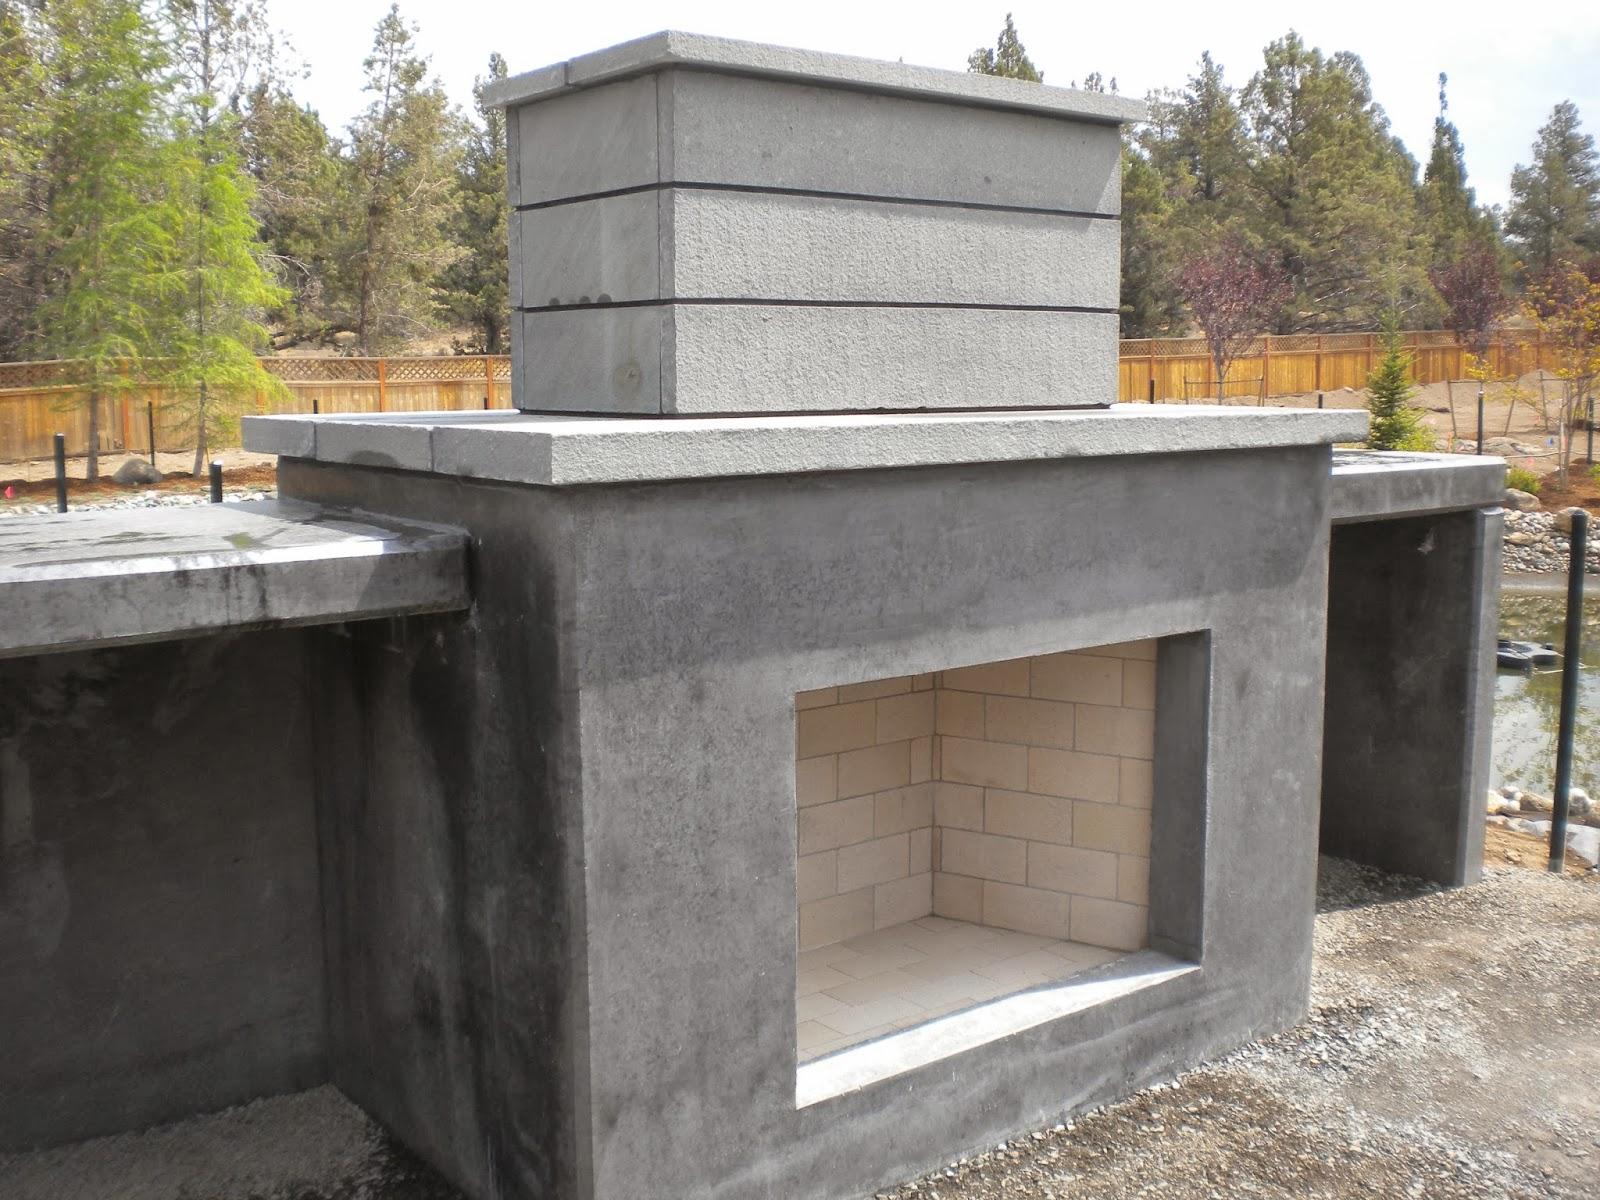 Outdoor Fireplace Installation : Boisineau masonry outdoor fireplace firebox and bluestone